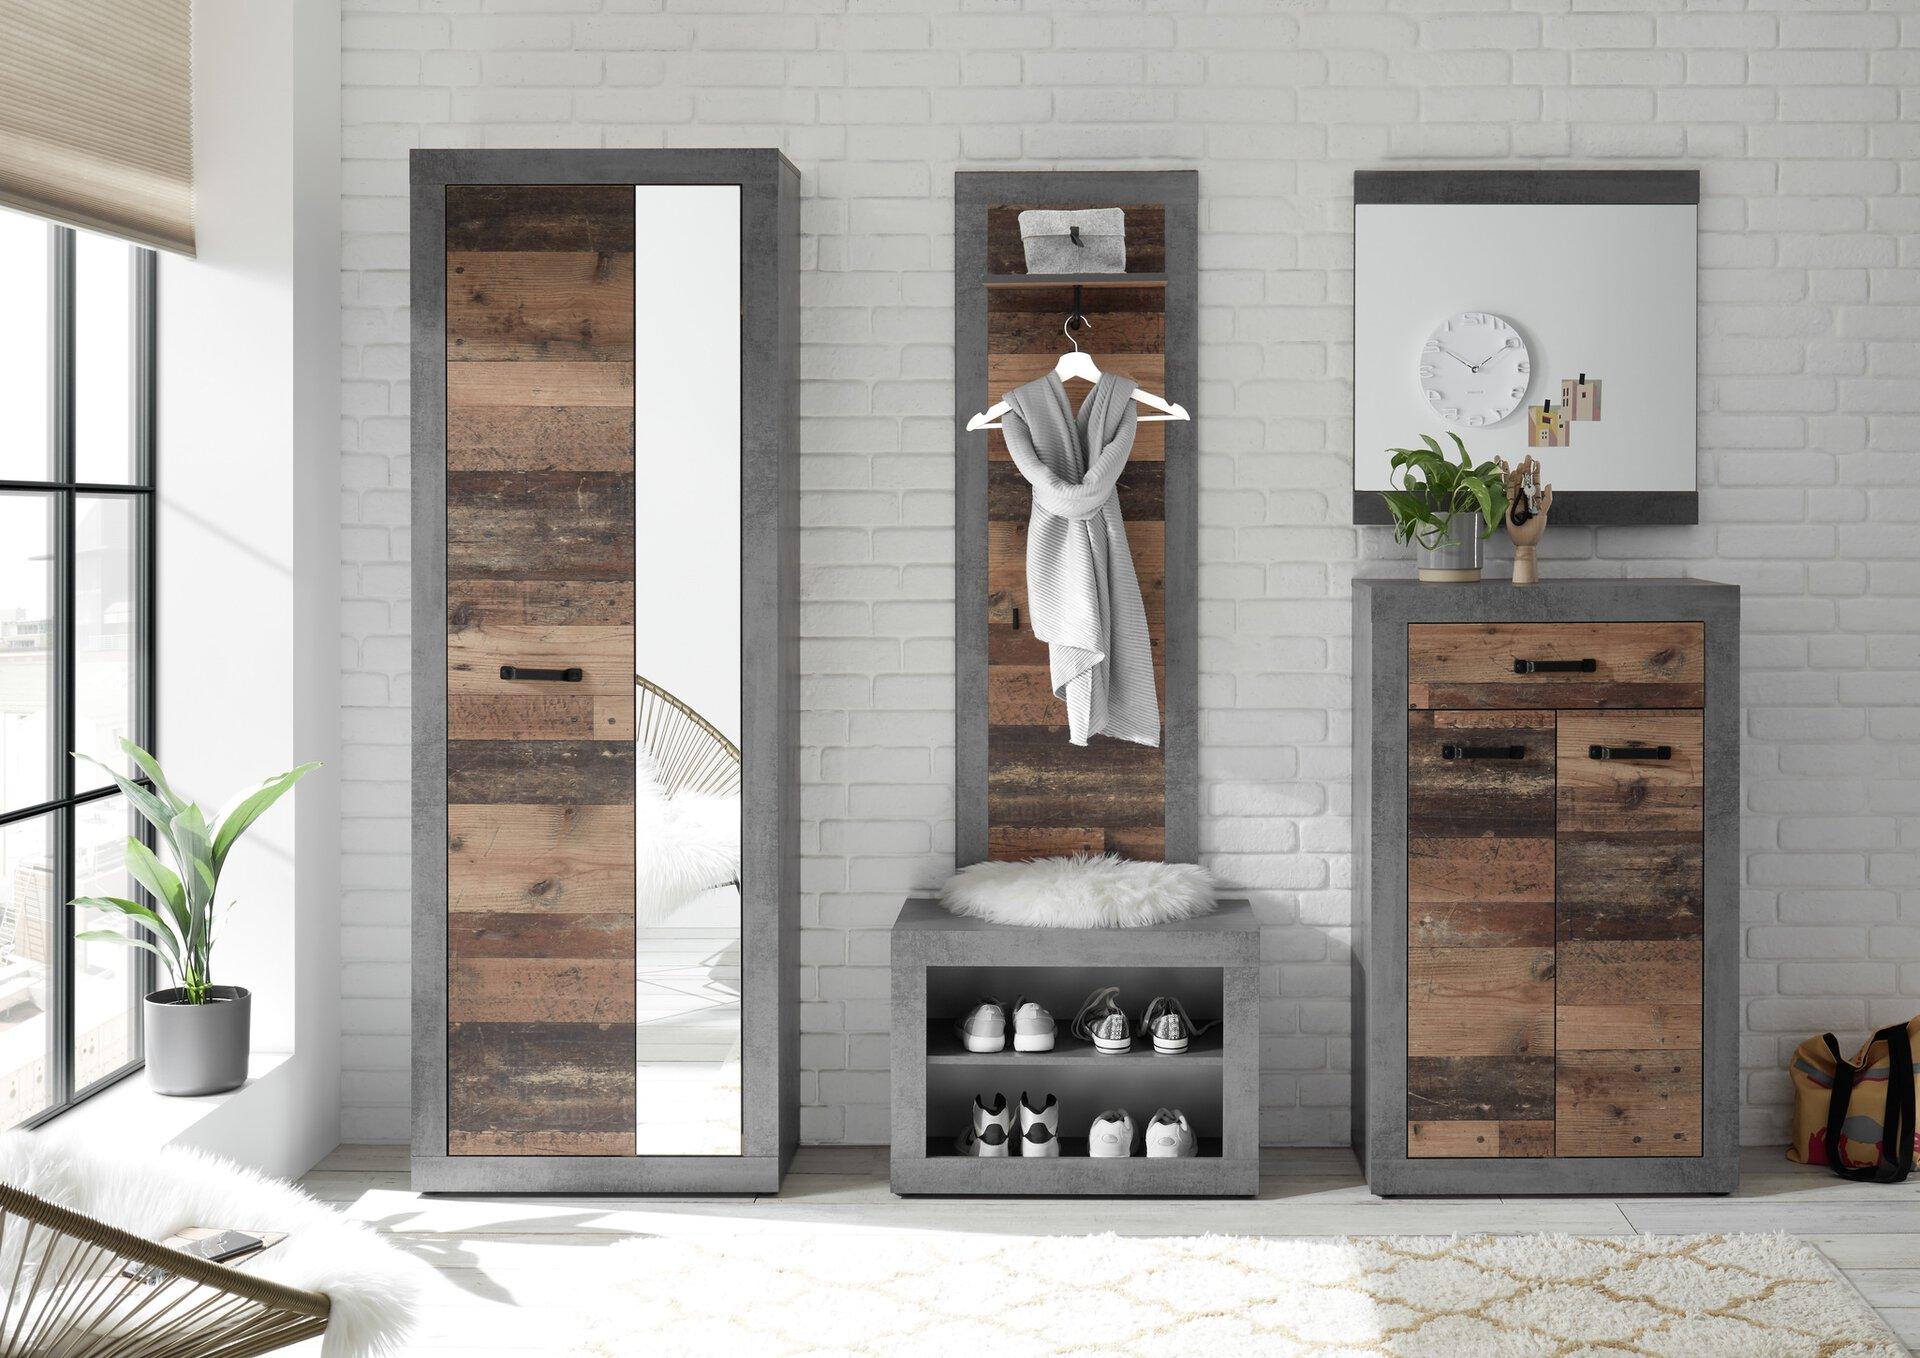 Spiegel INDIANA inDoor Holzwerkstoff mehrfarbig 3 x 70 x 68 cm